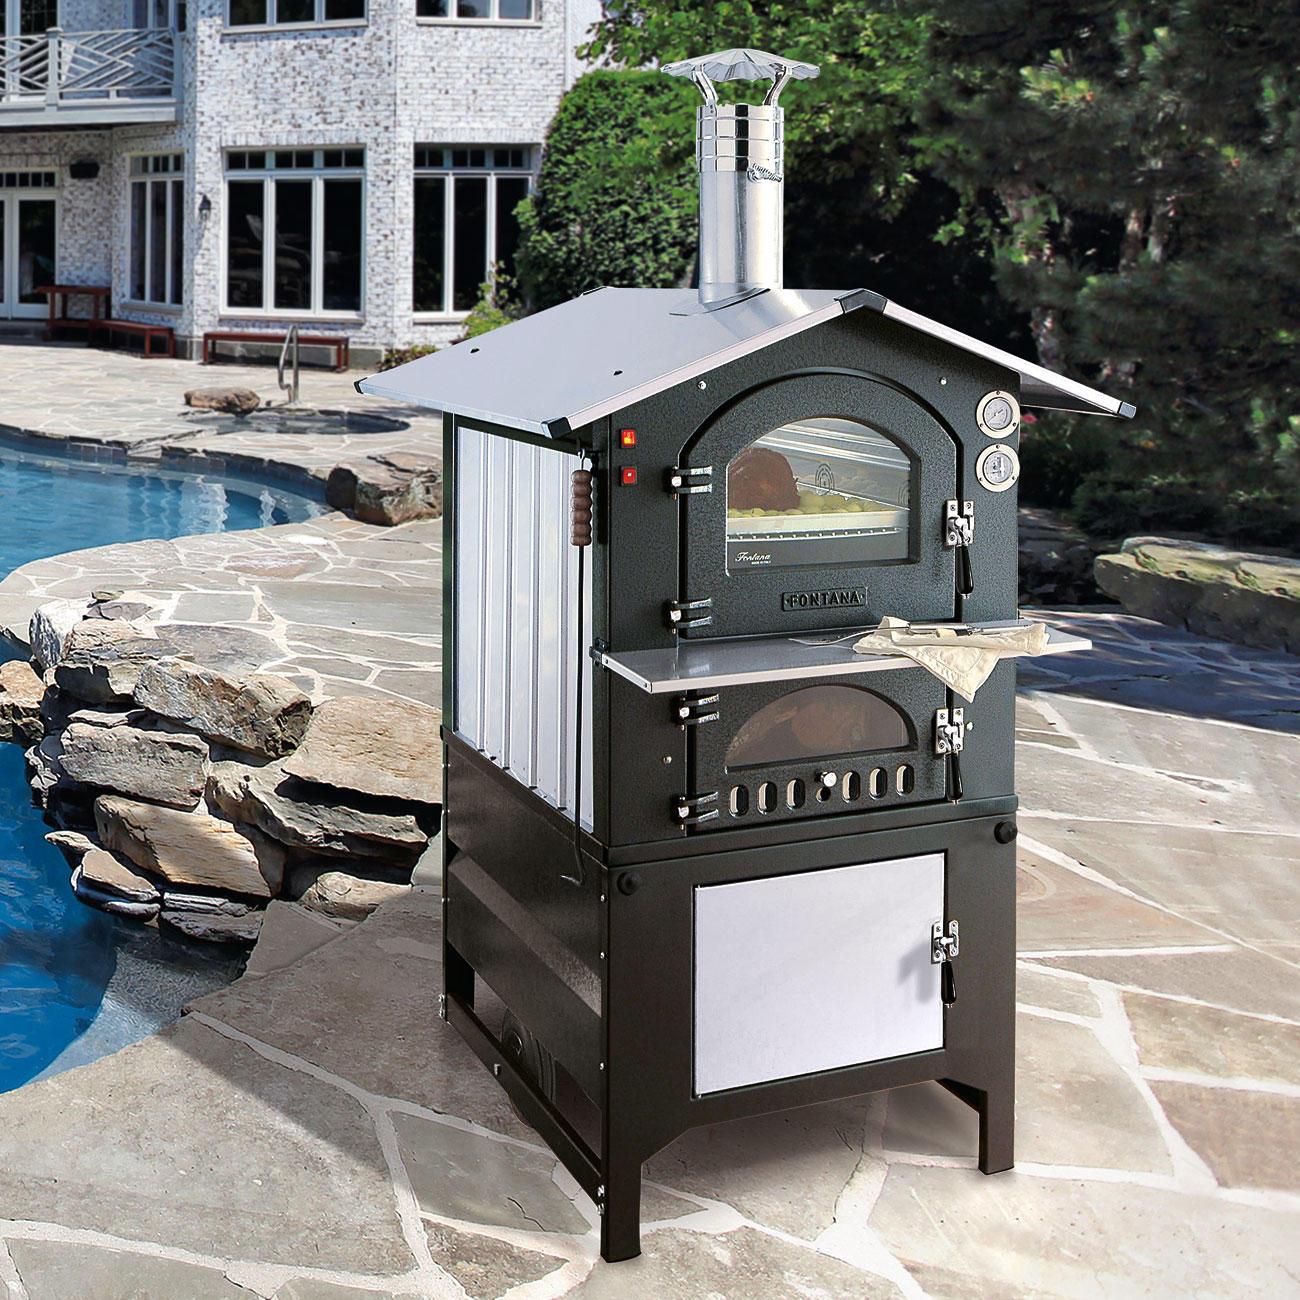 pizza holzbackofen fontana 3 jahre garantie pro idee. Black Bedroom Furniture Sets. Home Design Ideas